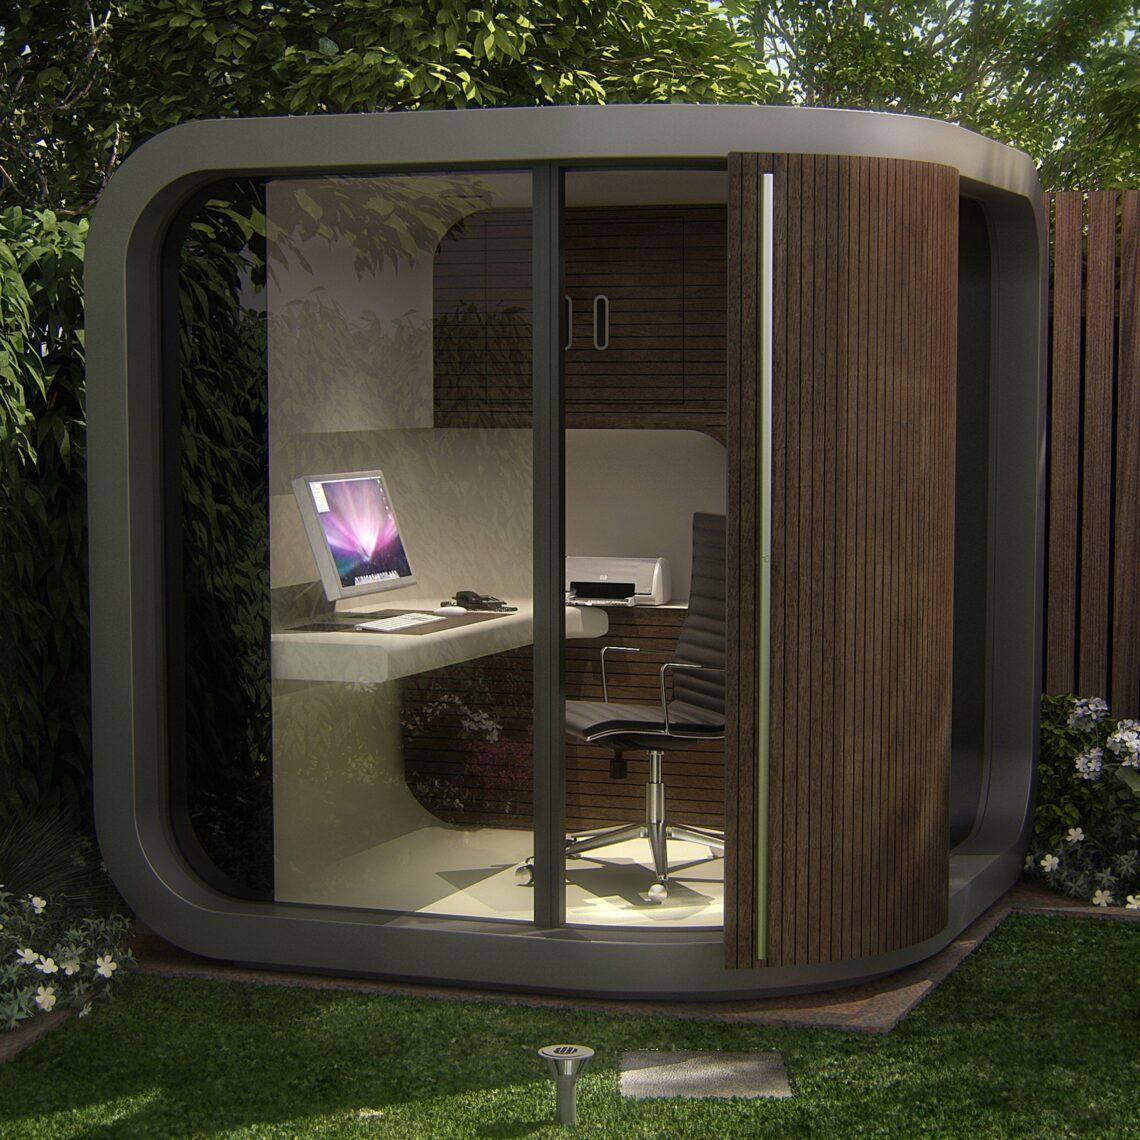 peter-s-office-space-cube-garden-mini-m-2